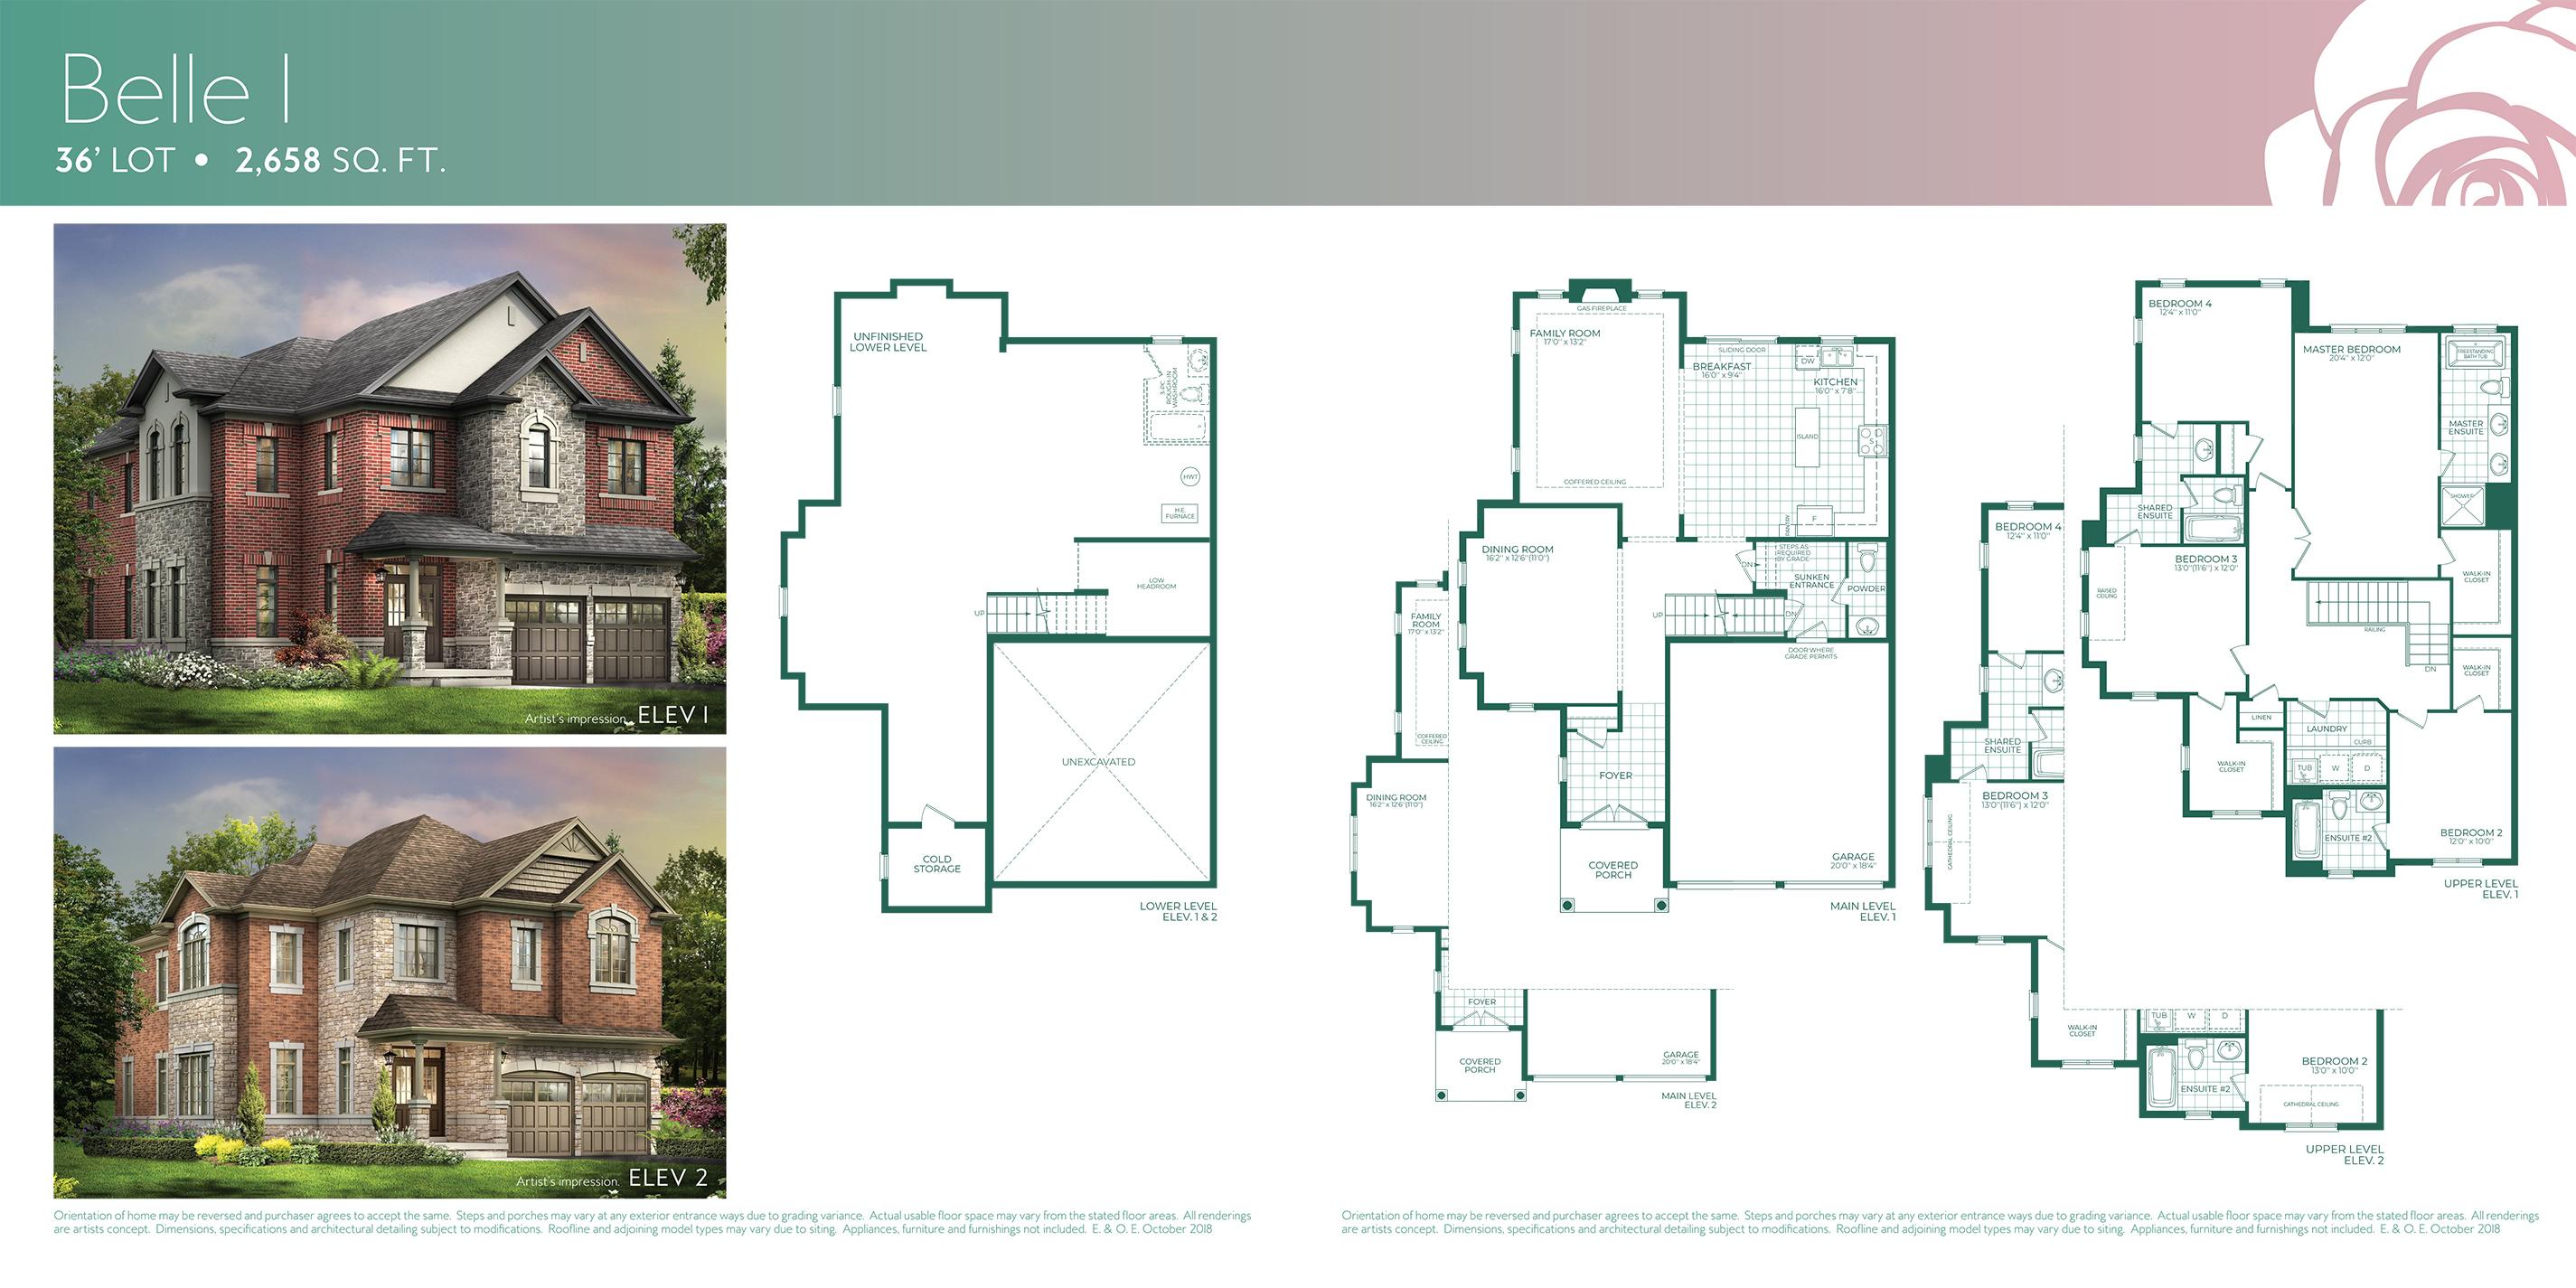 Belle 1 Floorplan